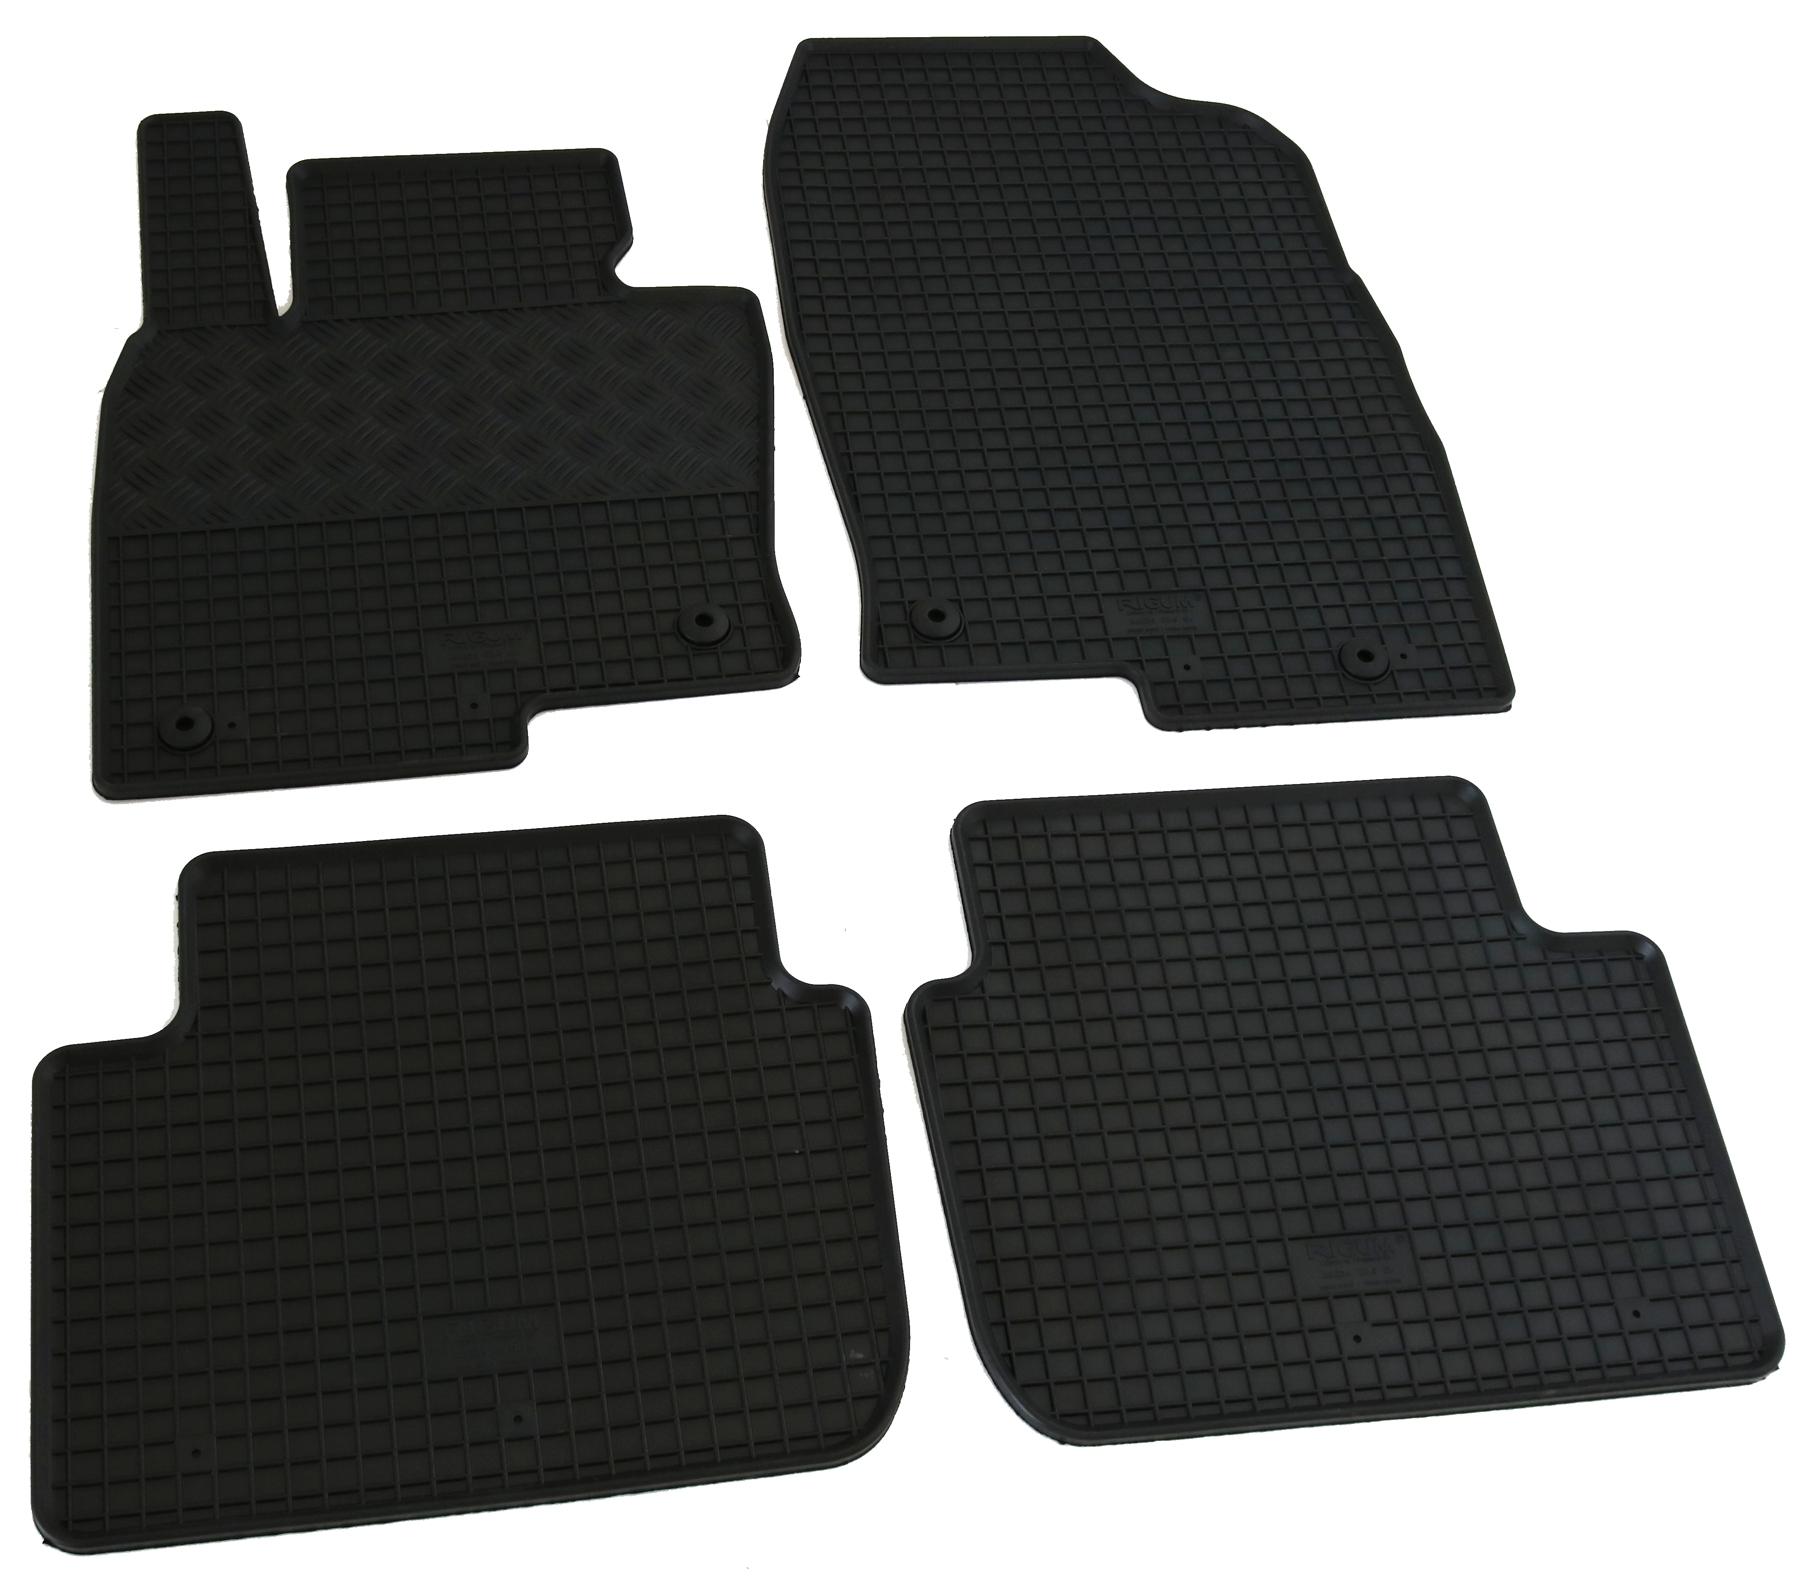 gummifu matten mazda cx 5 ii ab 2017 gummimatten gummi. Black Bedroom Furniture Sets. Home Design Ideas